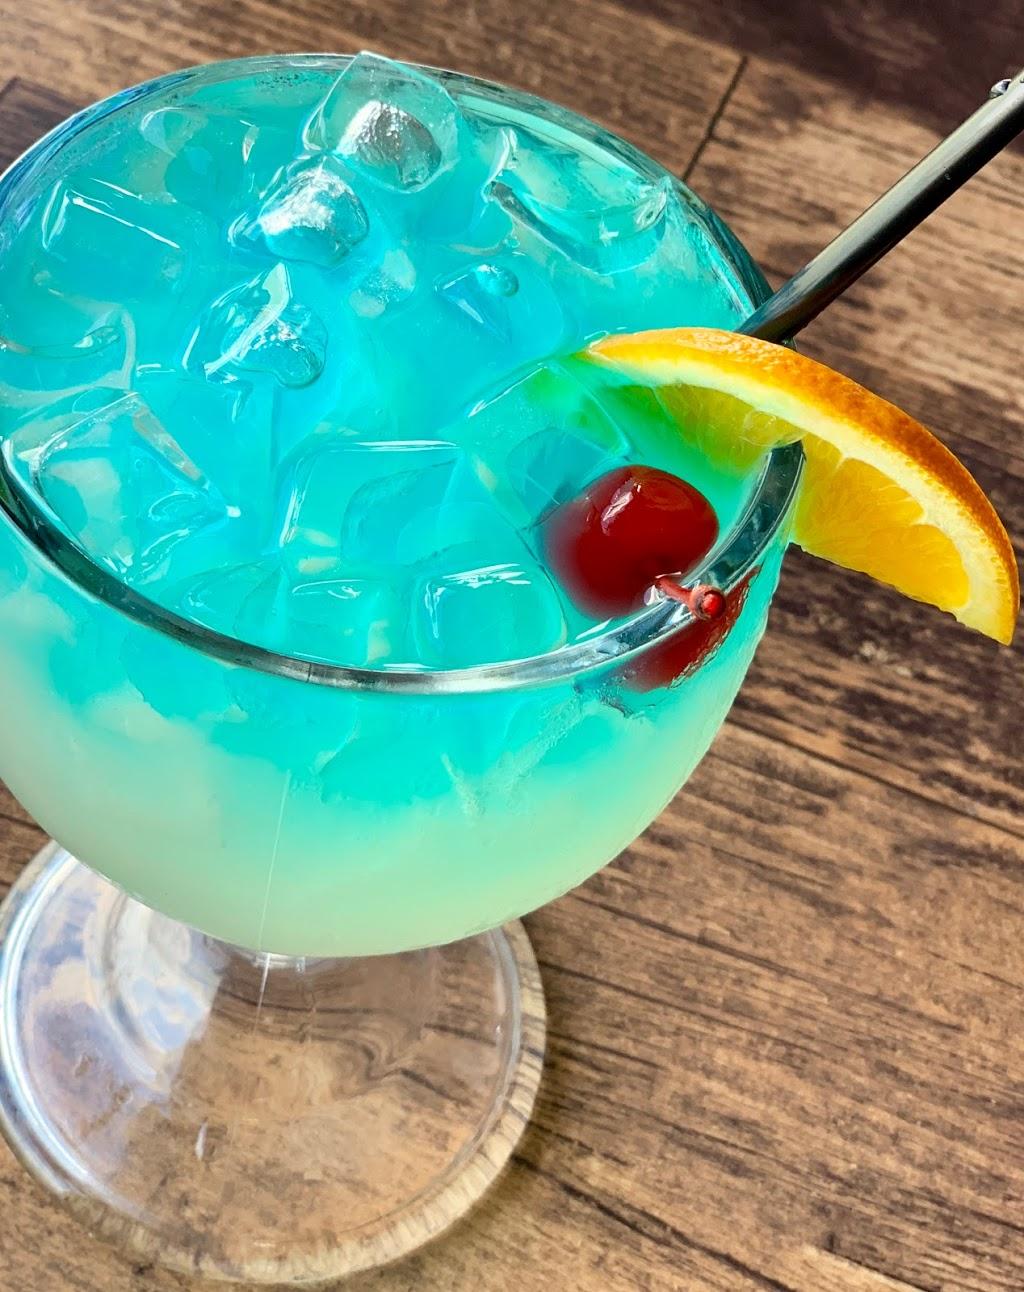 Scullys Sports Bar & Grill - restaurant  | Photo 10 of 10 | Address: 802 Fulton St, Port Lavaca, TX 77979, USA | Phone: (361) 482-0691